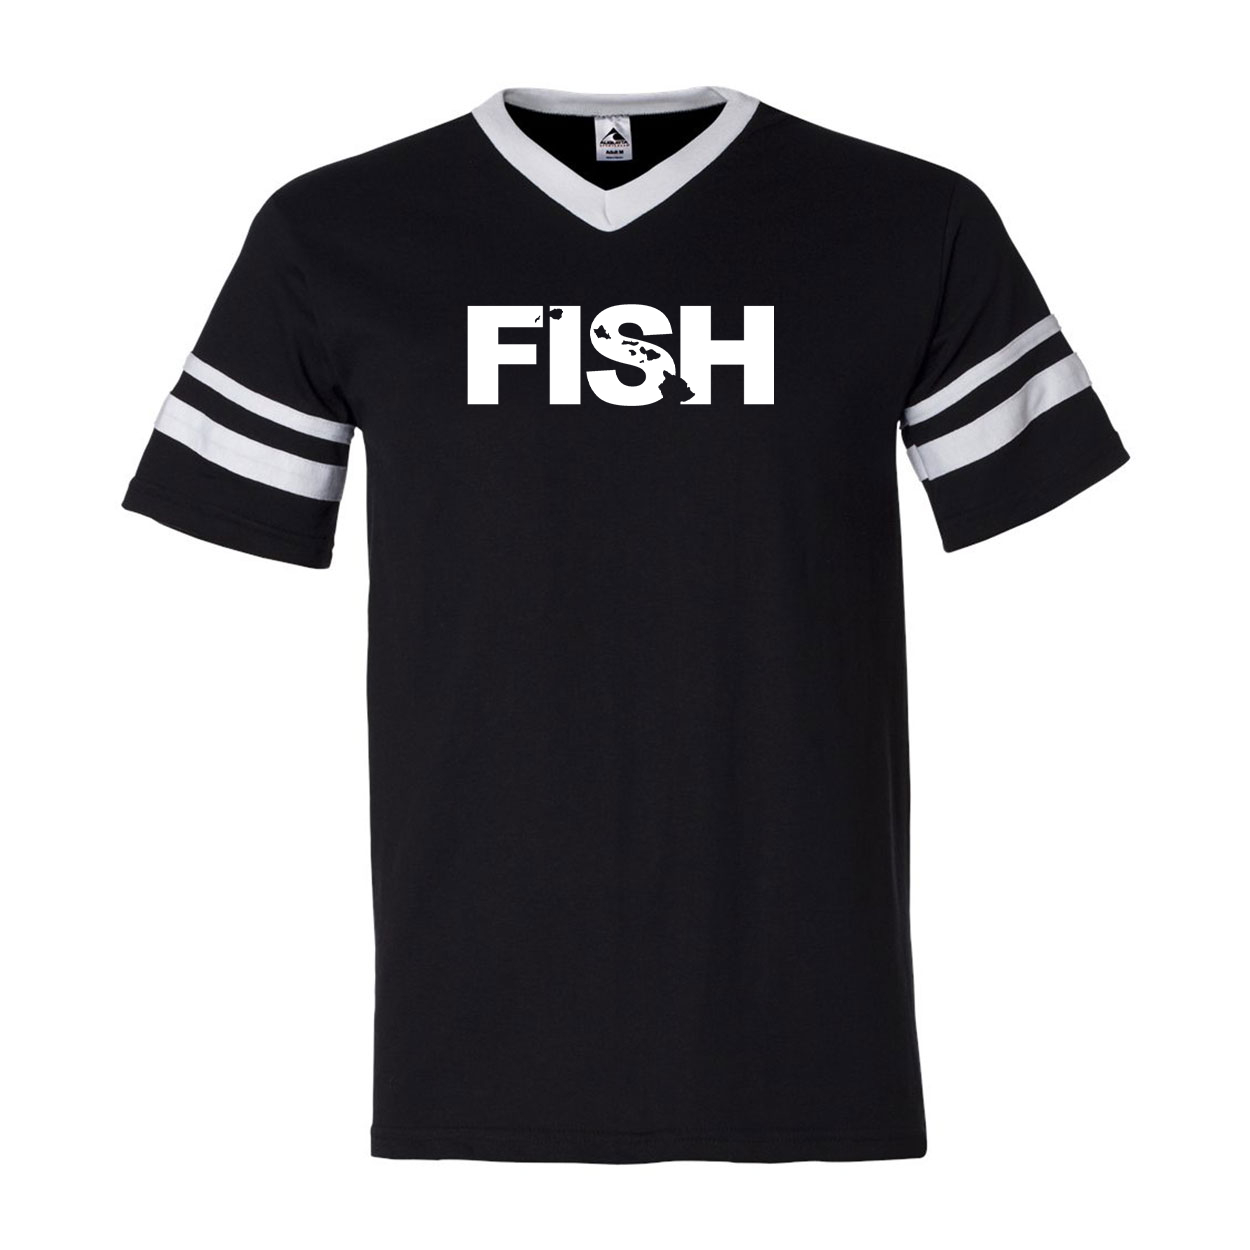 Fish Hawaii Classic Premium Striped Jersey T-Shirt Black/White (White Logo)